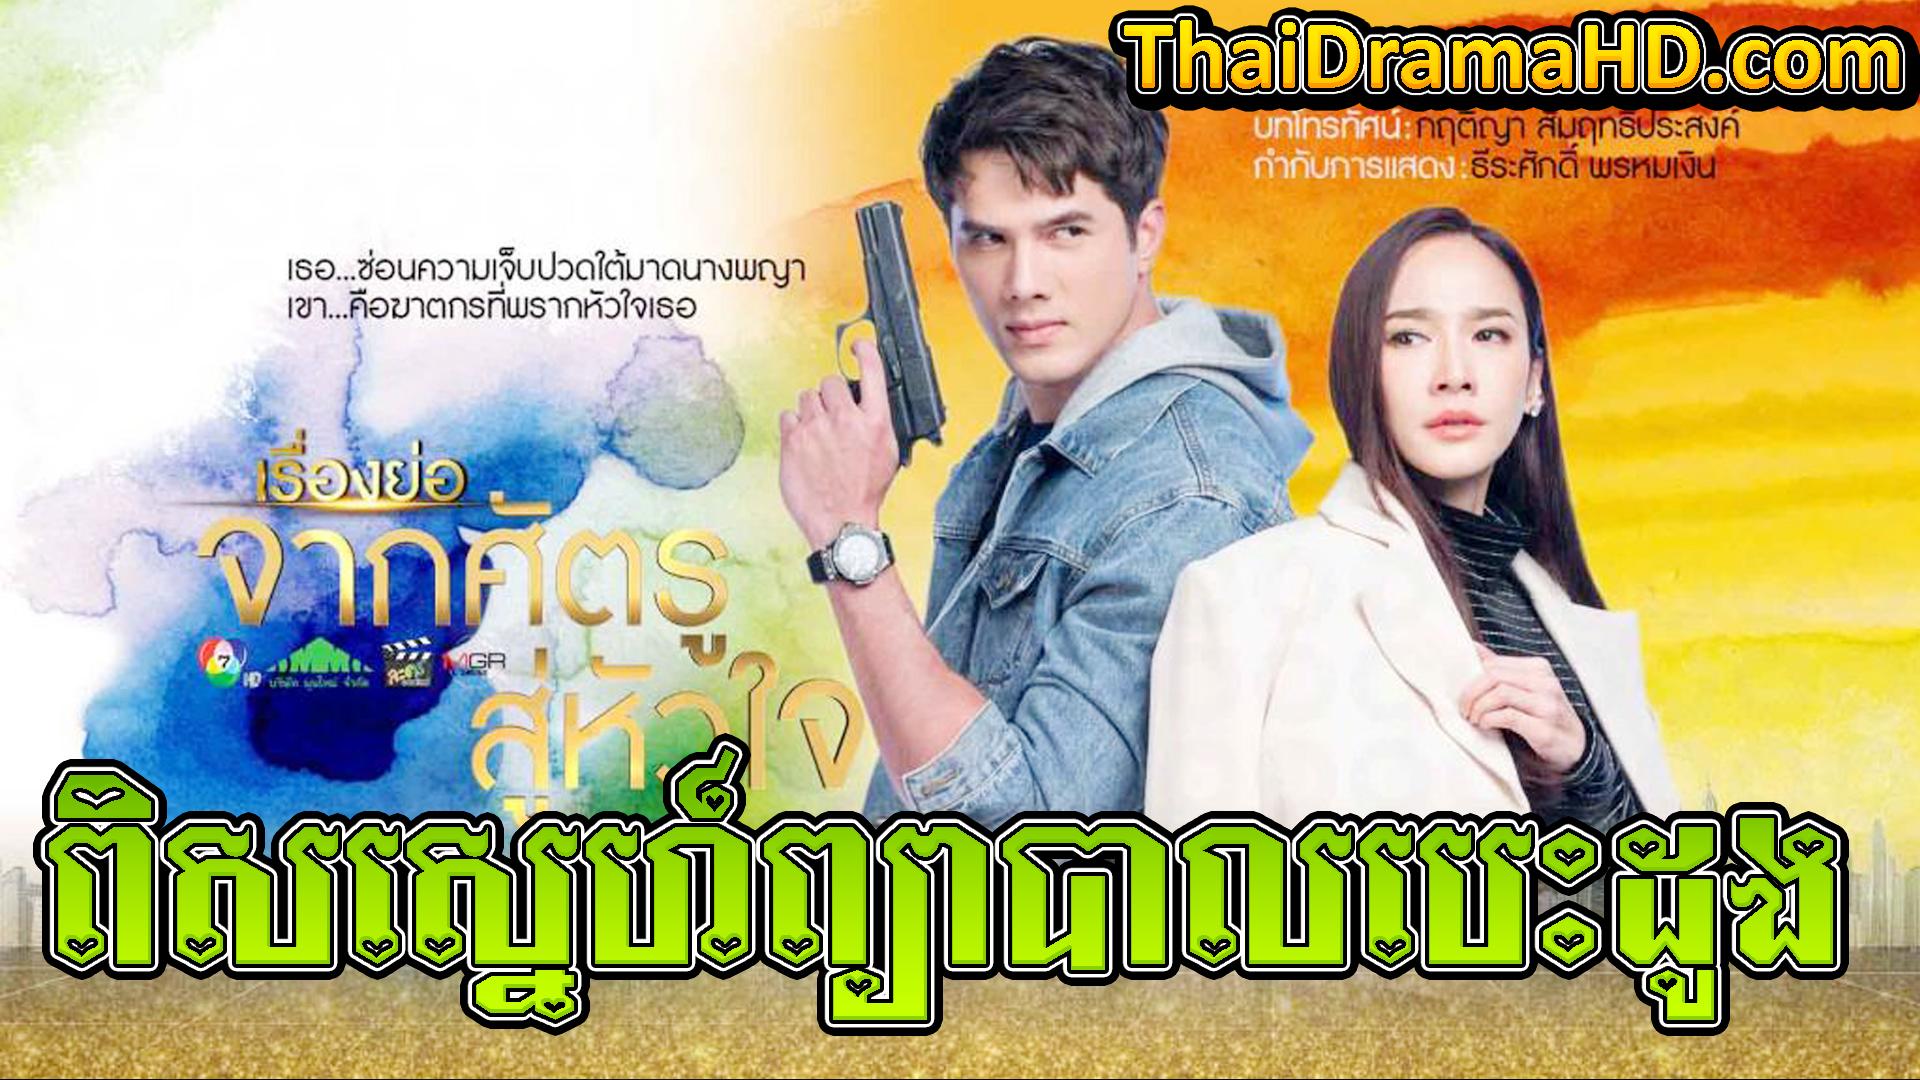 Pirs Sne Phyeabal Besdong, Thai Drama, Thai Drama HD, Khmer Movie, Phumikhmer, Phumikhmer1, movie-khmer, video4khmer, khmotions, kolabkhmer, khmer drama, ksdrama, cookingtips, roscheat, khmertimeskh, khmerkomsan, phumi7, merlkon, film2us, movie2kh, sweetdrama, khmercitylove, khreplay, tvb cambodia drama, ckh7, srokthai, phumimedia, phumi8, khmer avenue, khmer search, Soyo, khmerfans